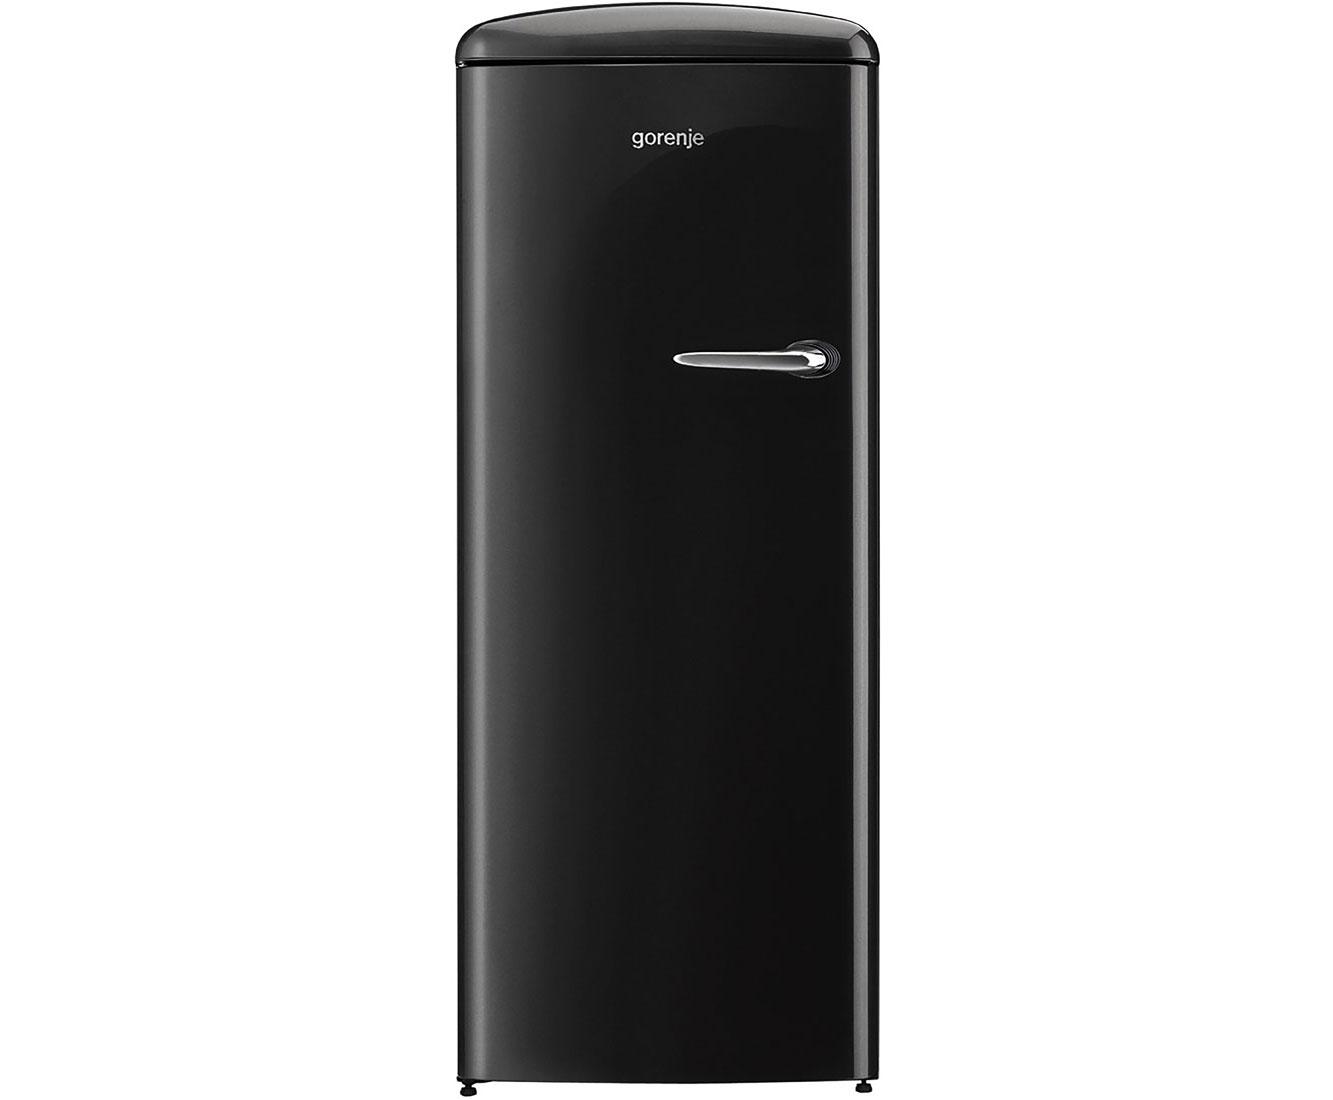 Gorenje Kühlschrank Mint : Gorenje retro kühlschrank küchen umstyling go retro gorenje